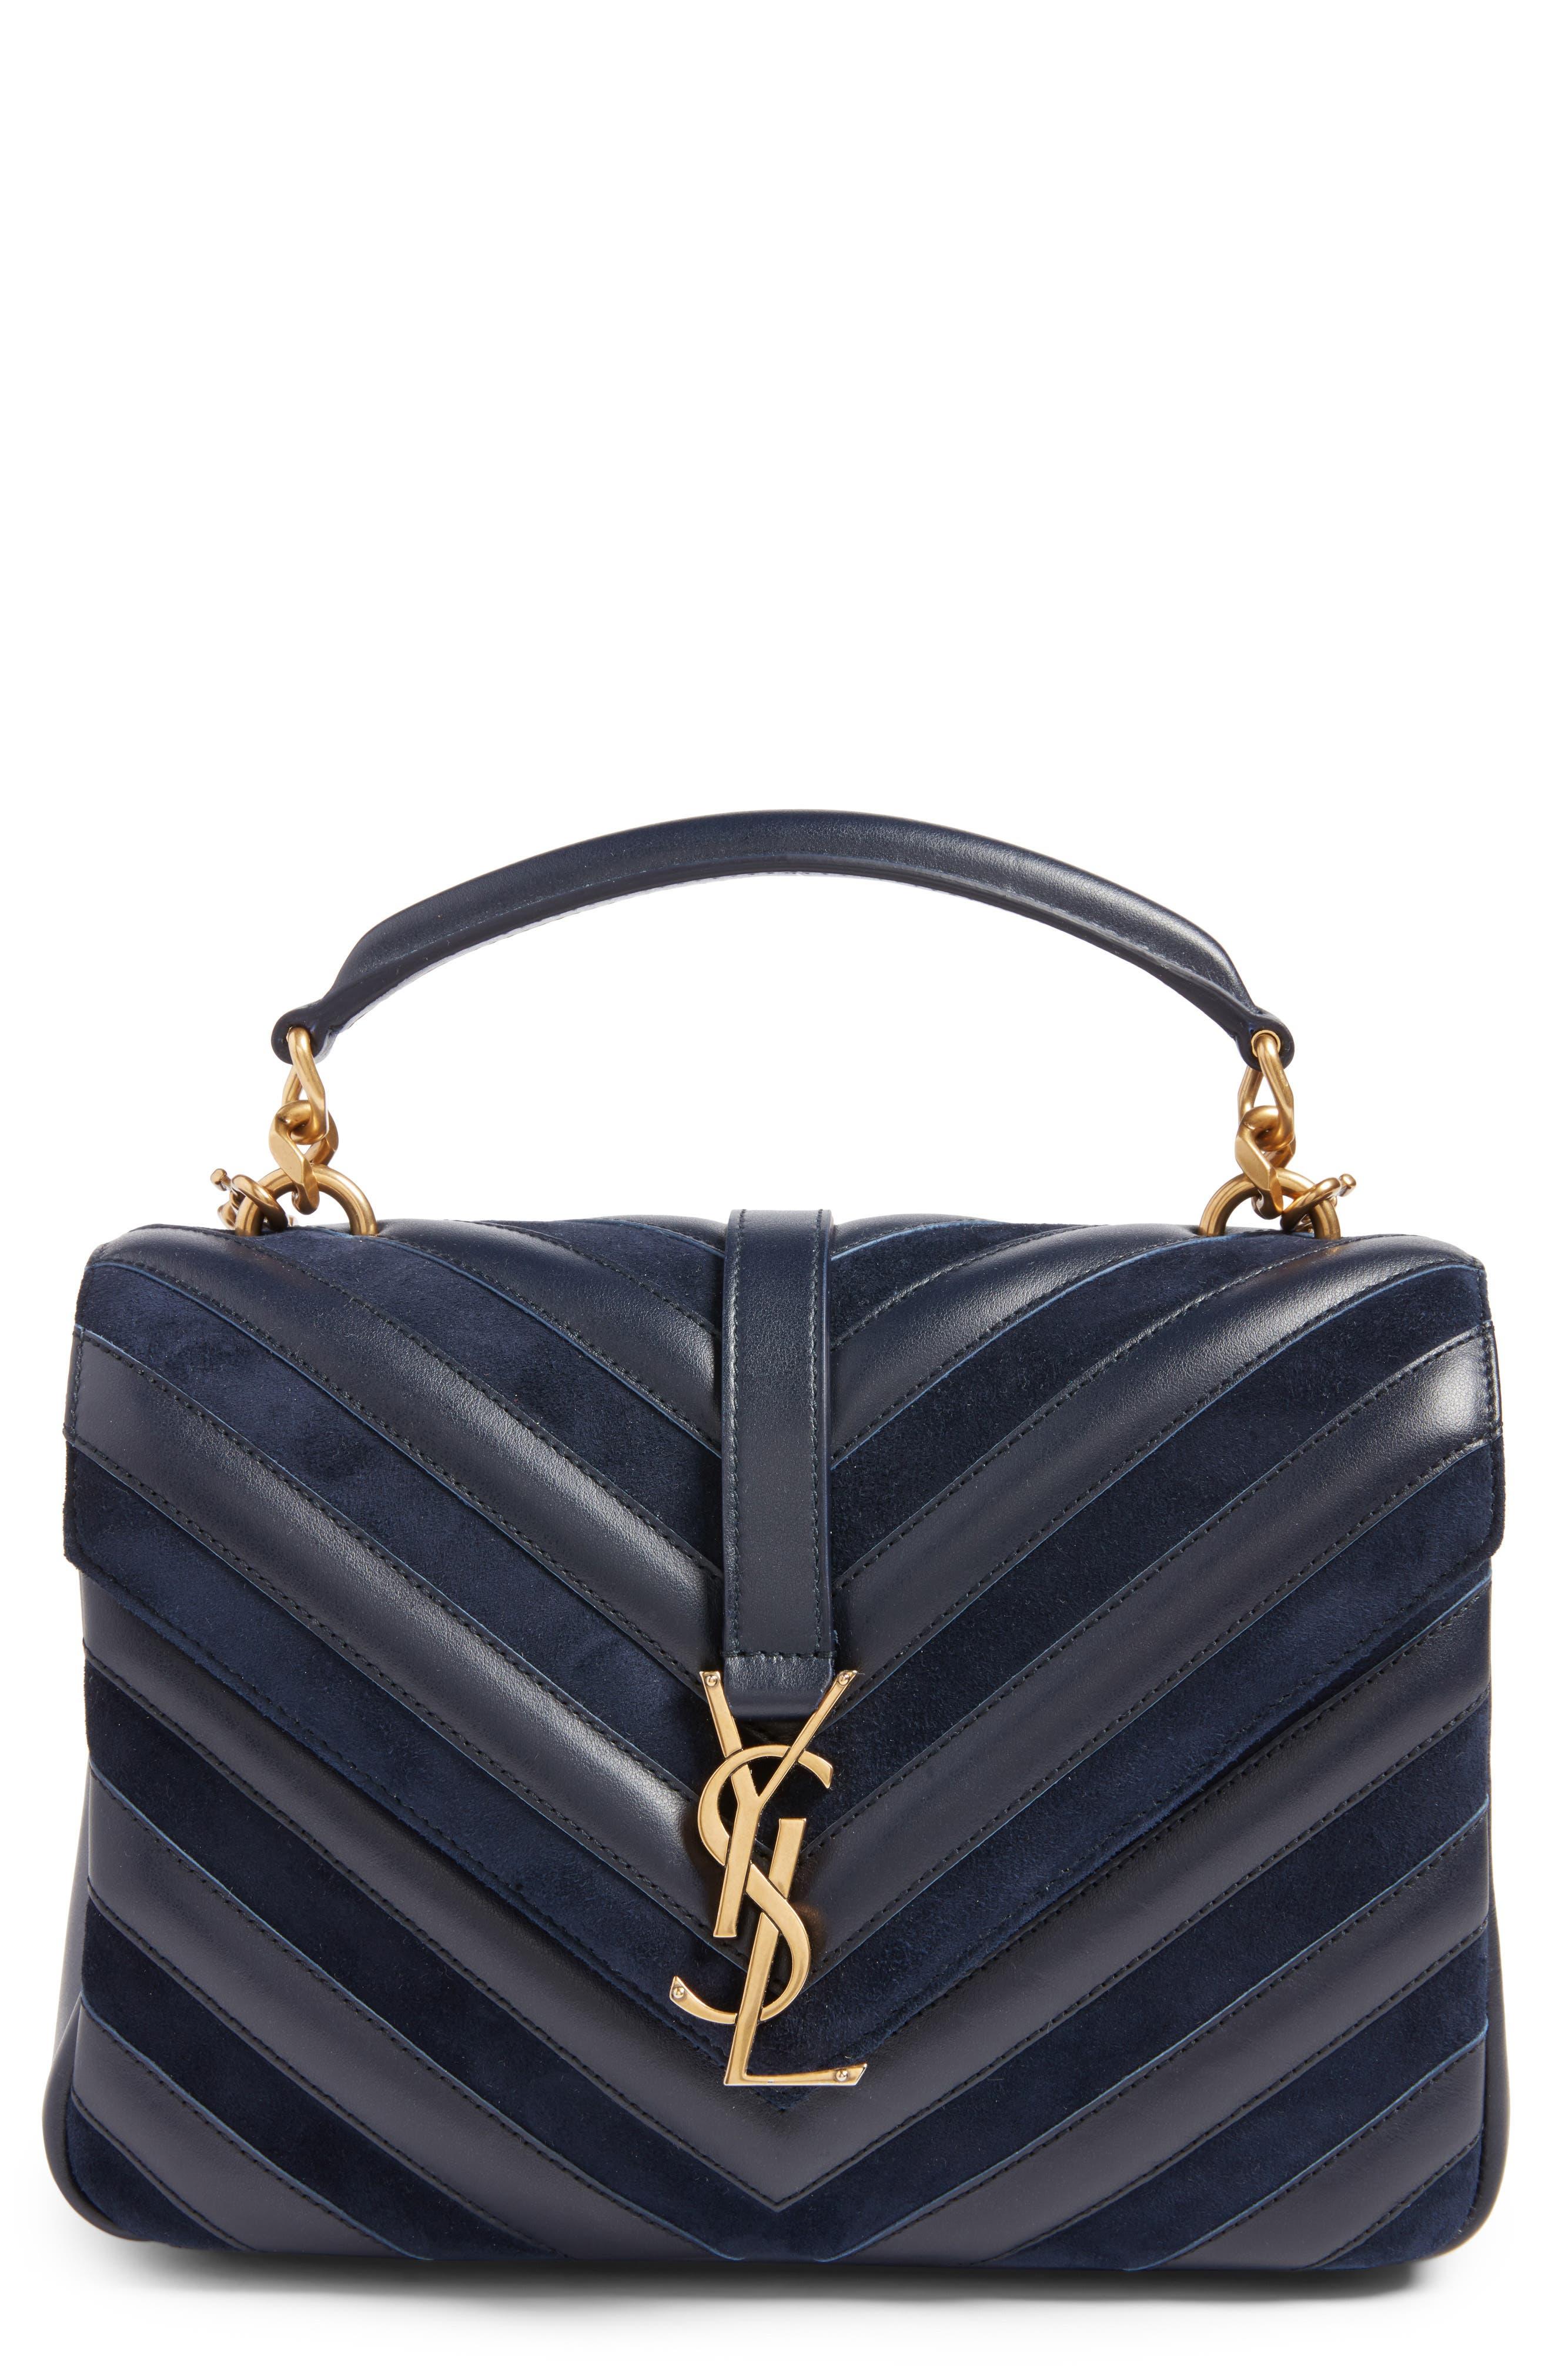 Medium College Patchwork Suede & Leather Shoulder Bag,                             Main thumbnail 1, color,                             Deep Marine